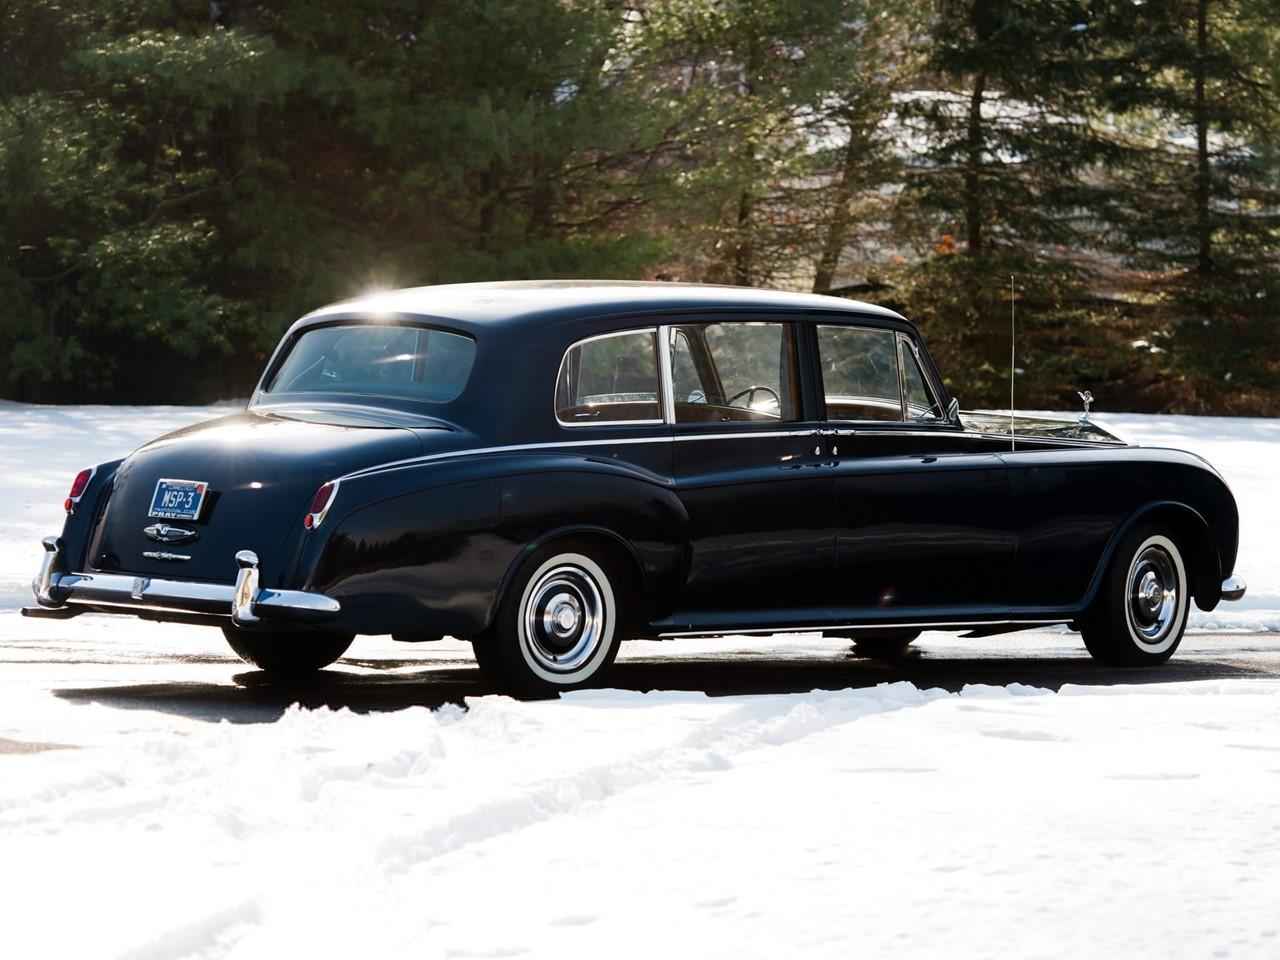 1959 Phantom V Park Ward coachbuilt limousine 3